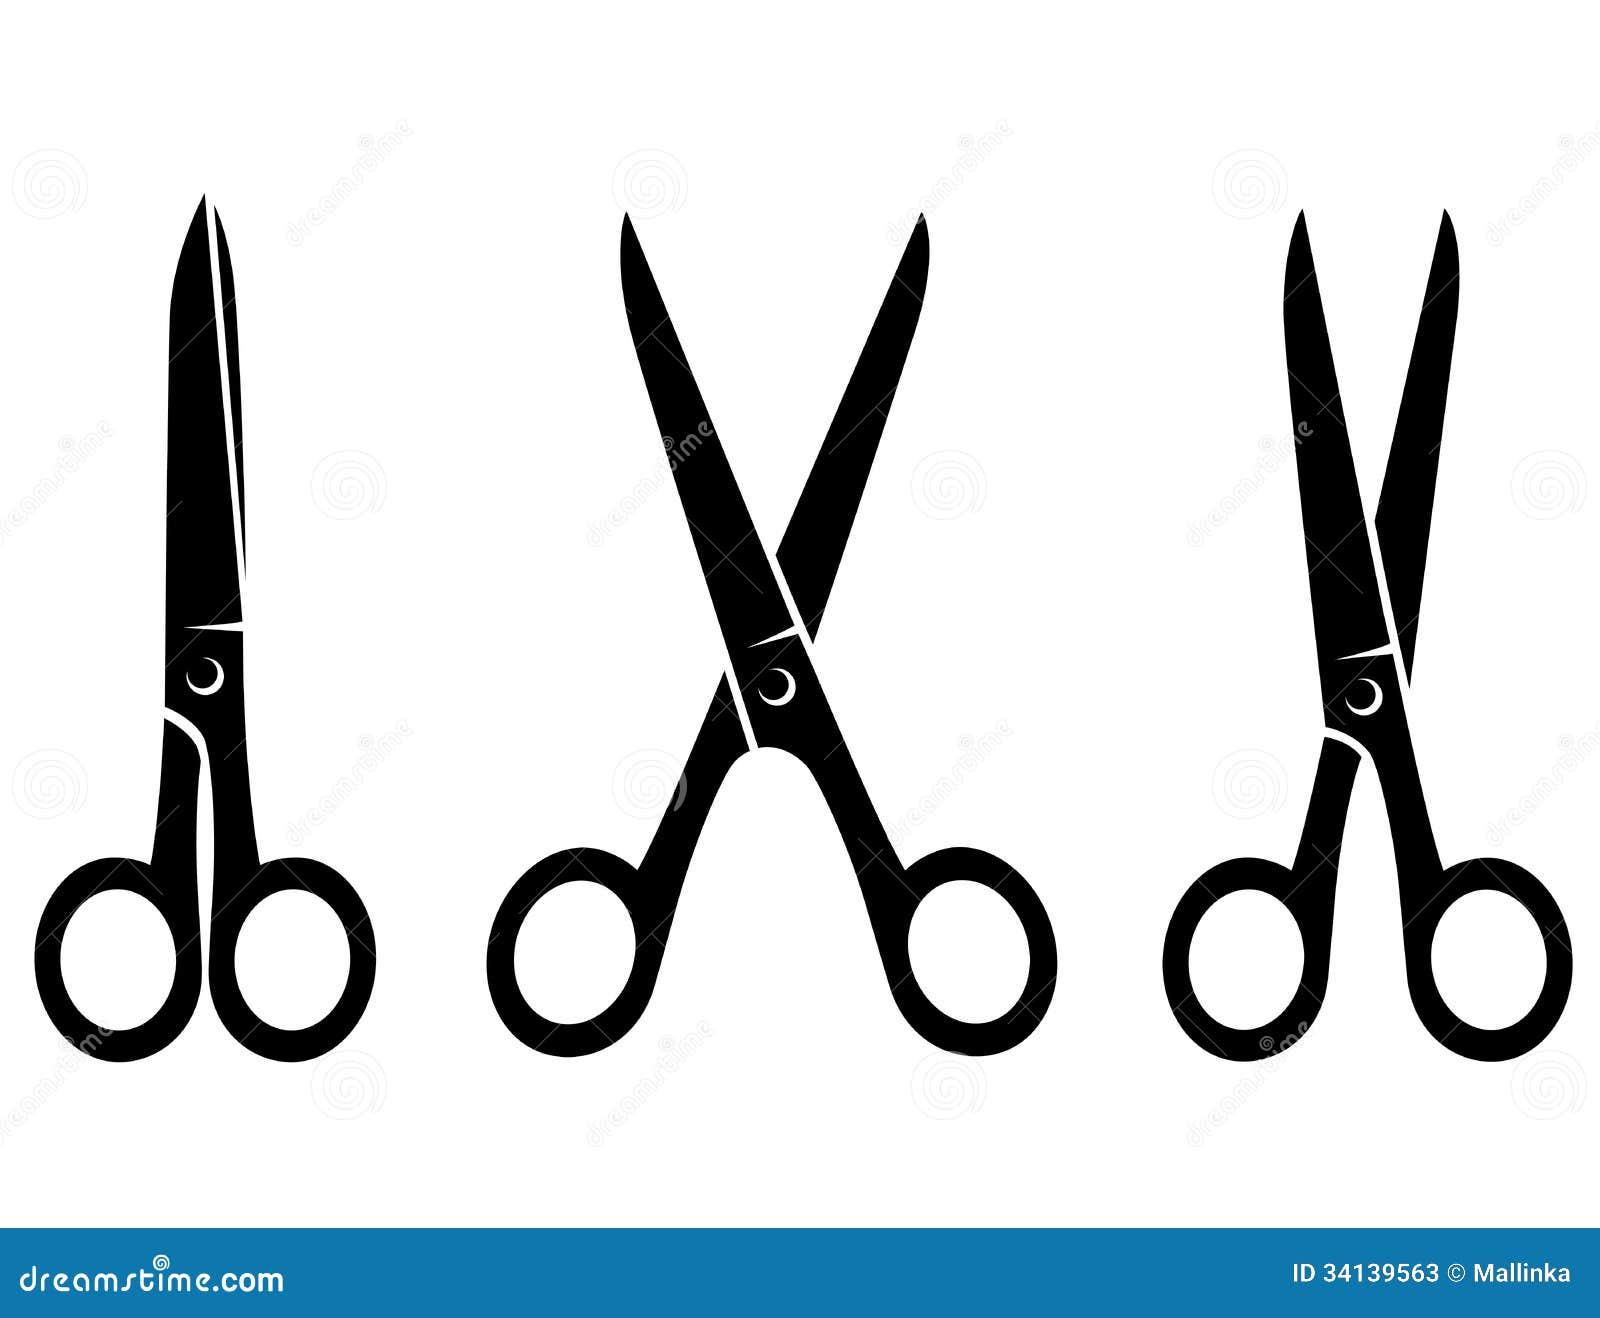 Isolated Black Scissors On White Background Stock Photos